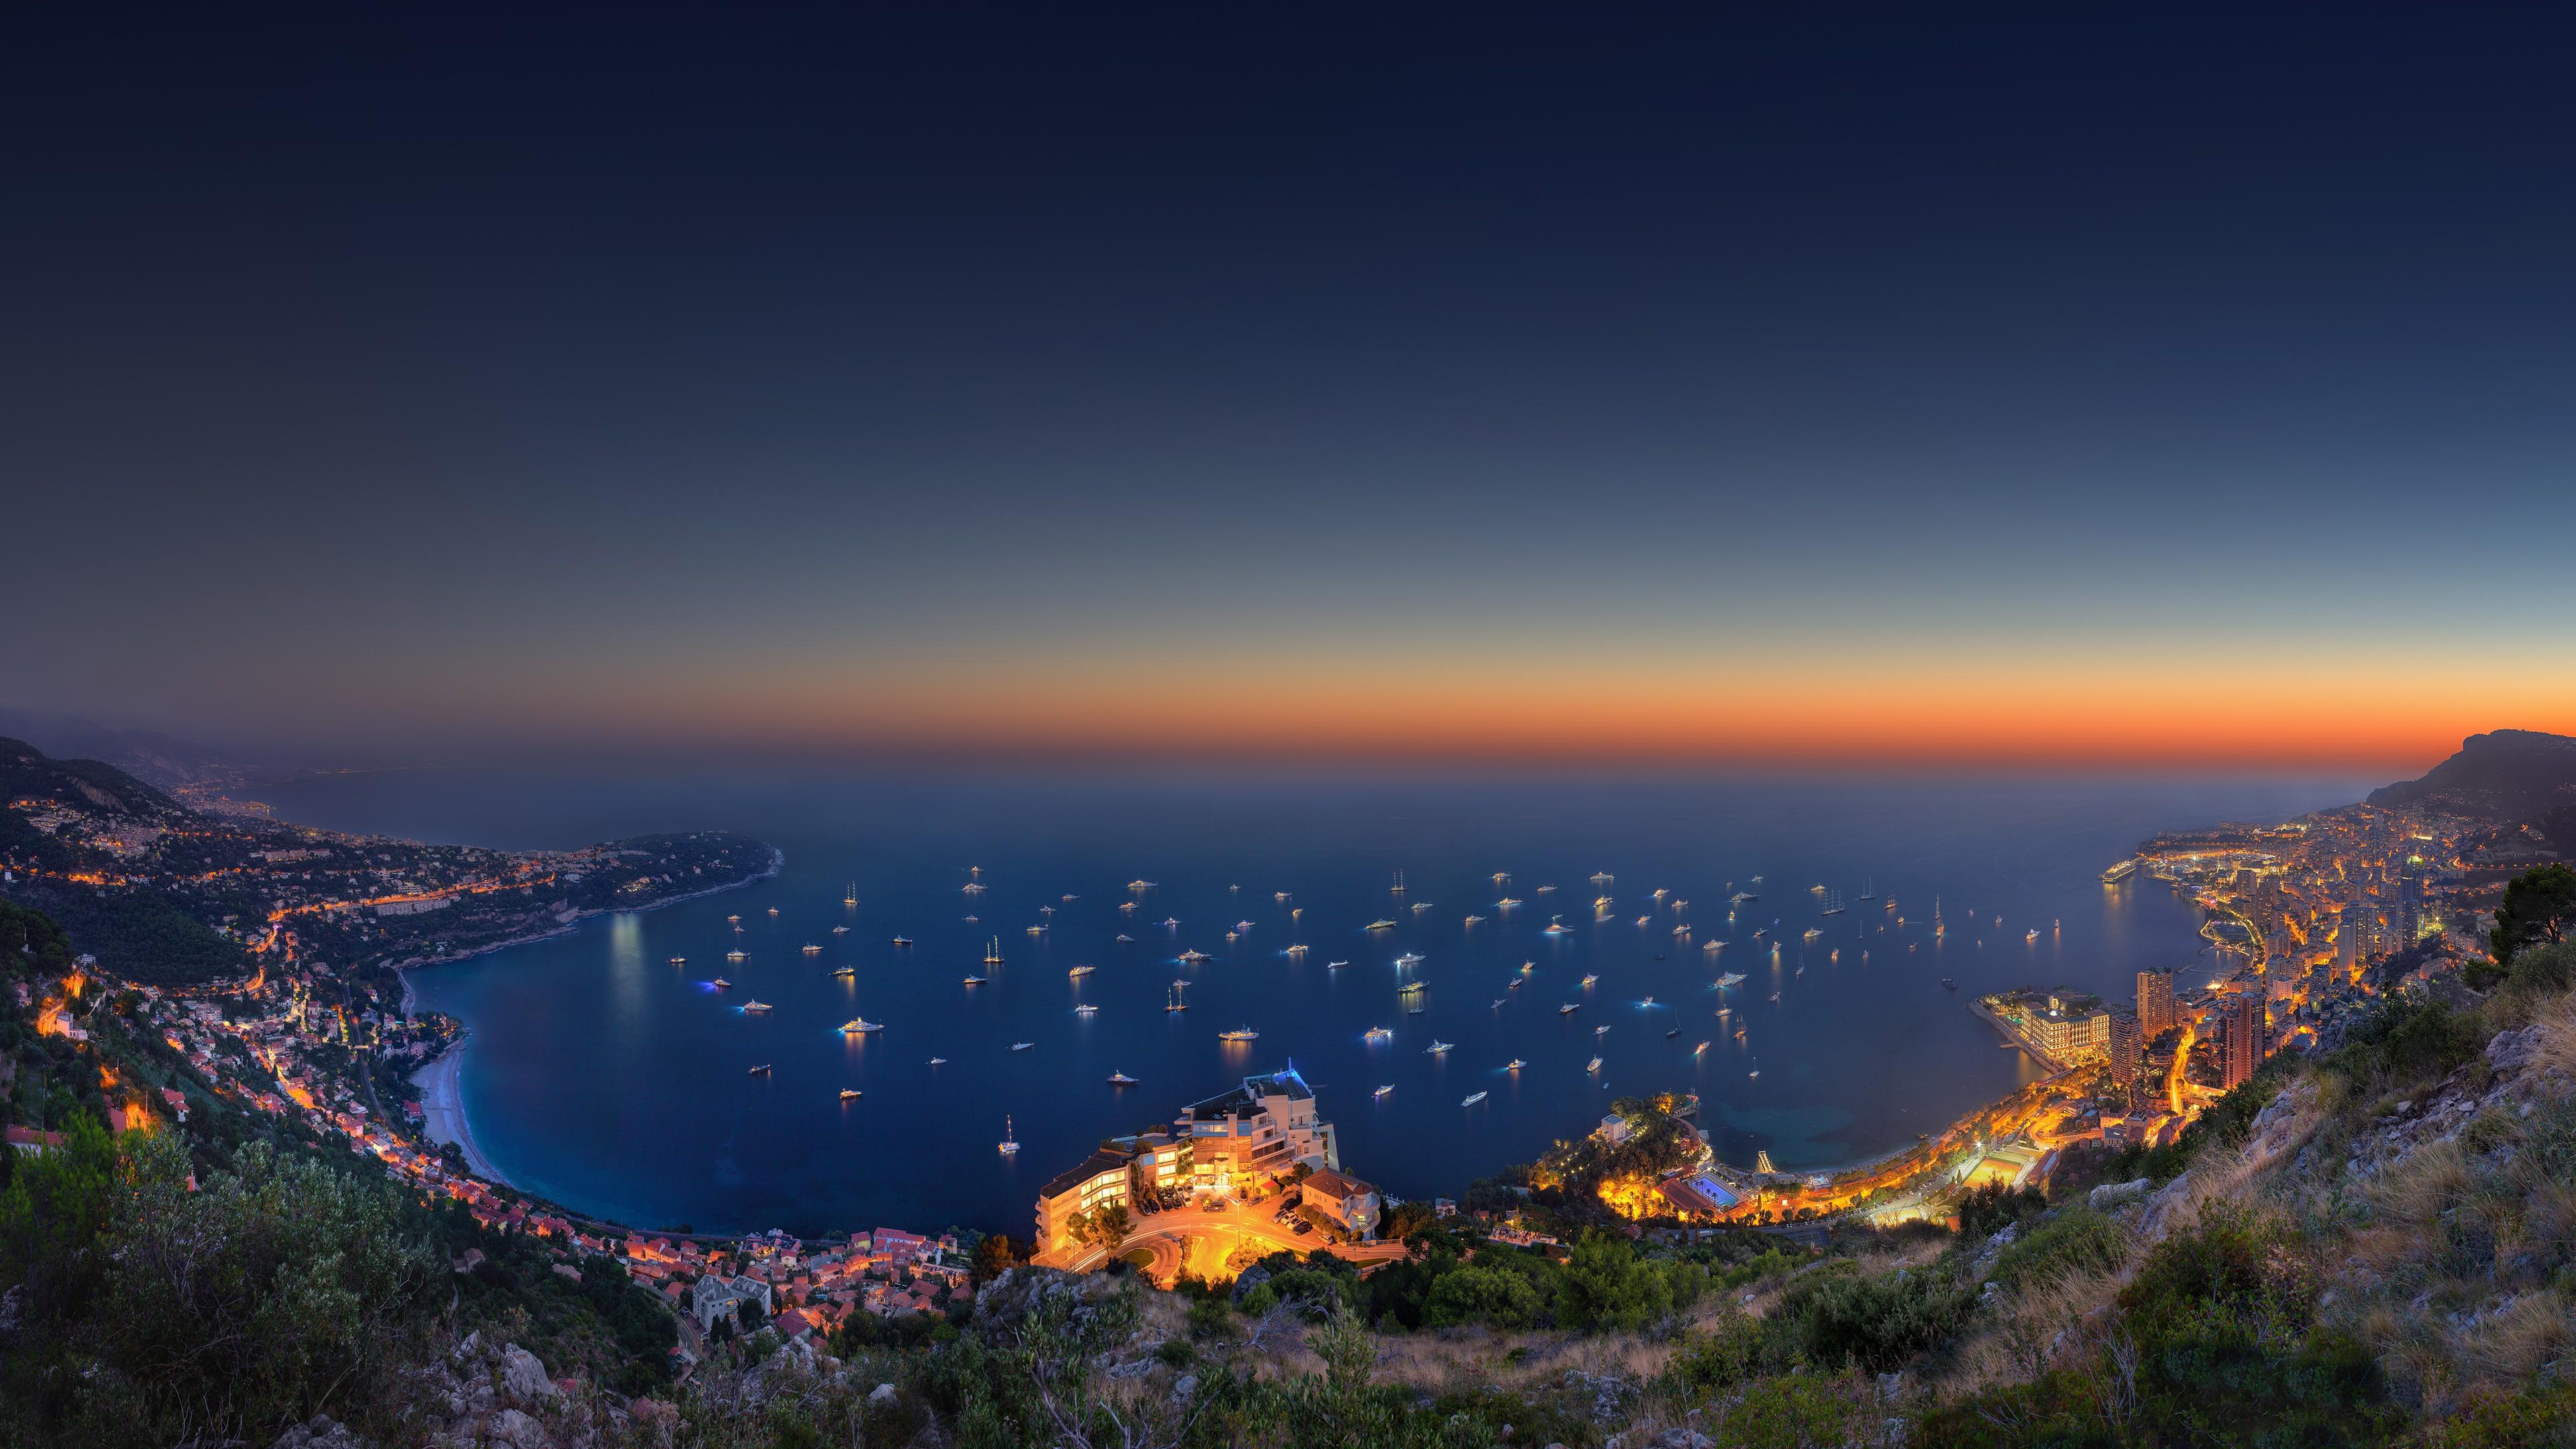 Monaco 4k, HD World, 4k Wallpapers, Images, Backgrounds